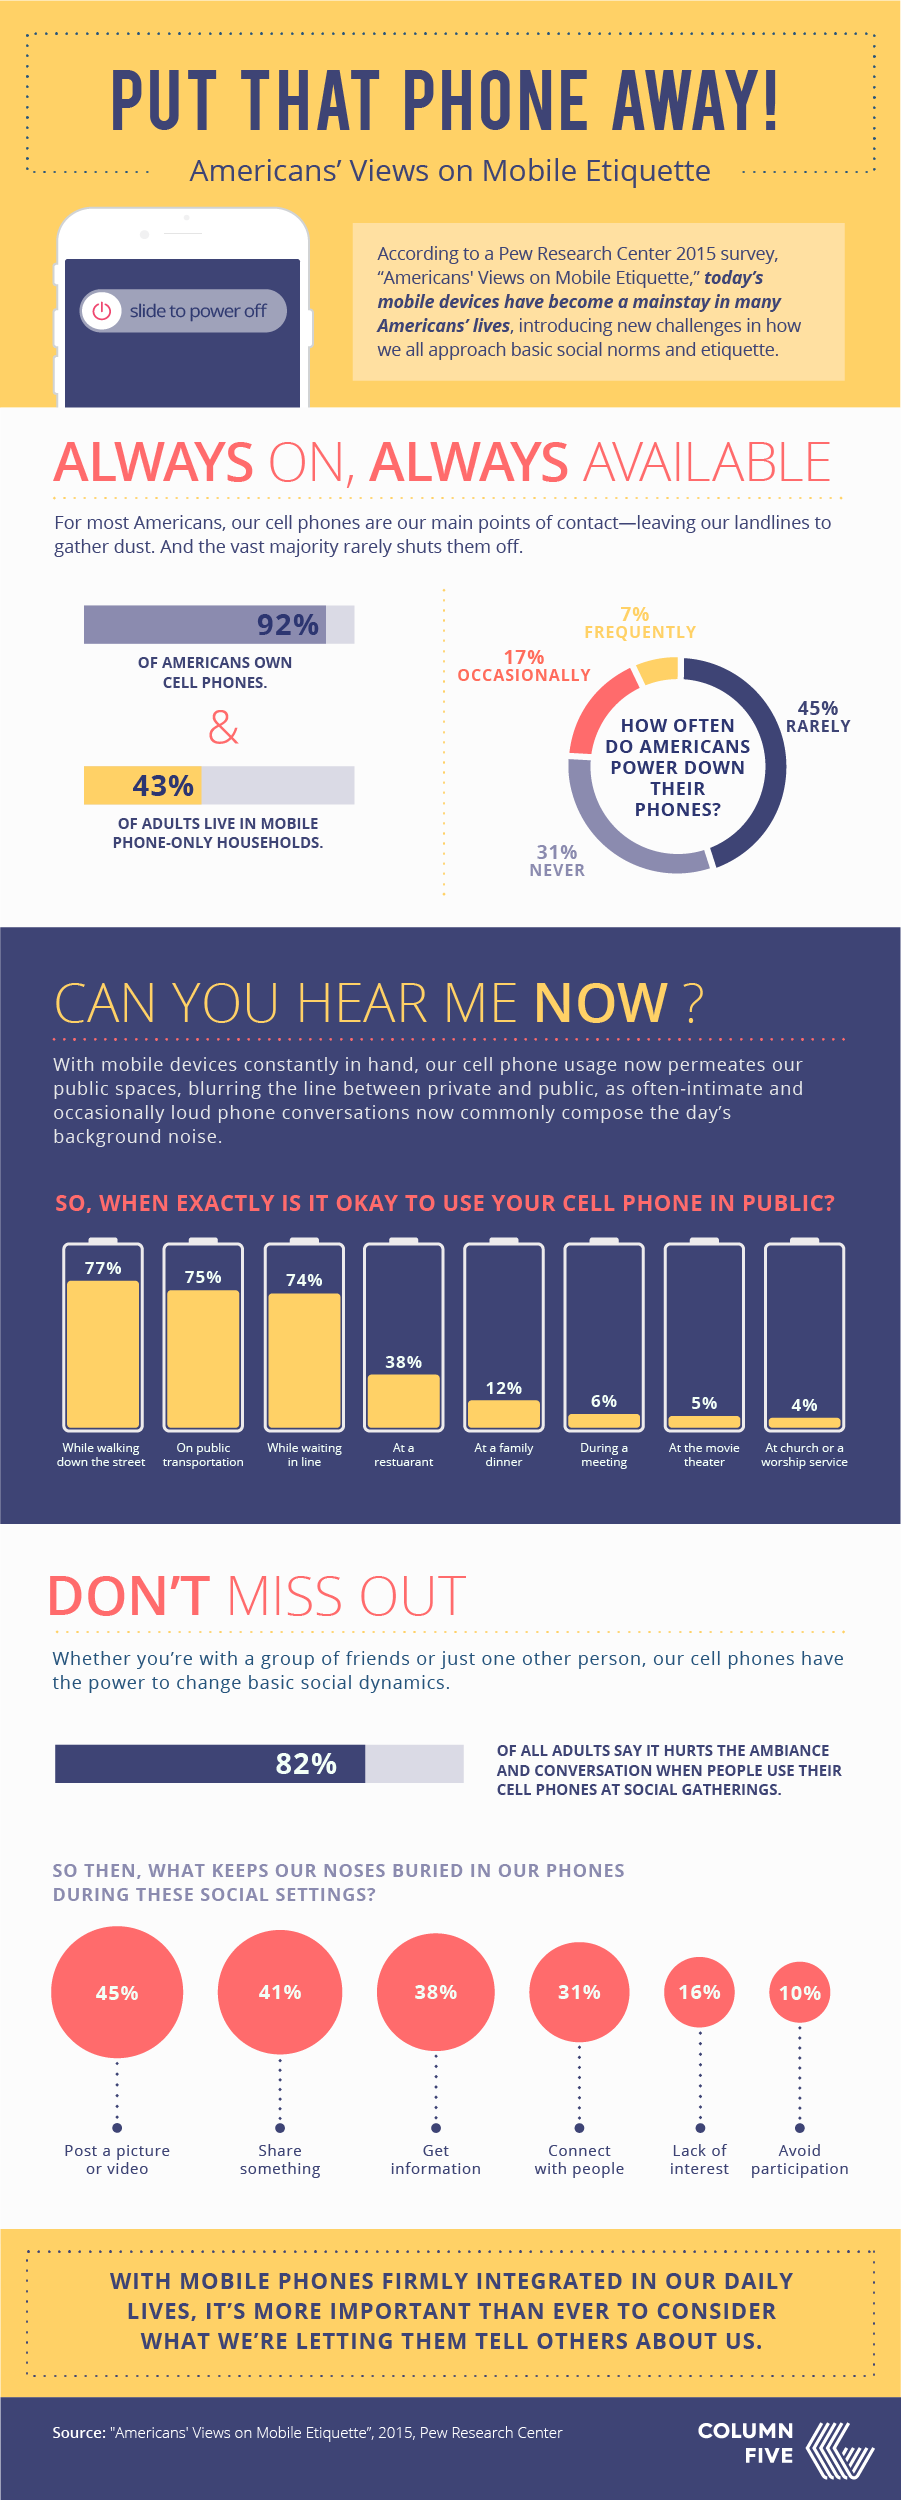 Mobile_Etiquette_Infographic